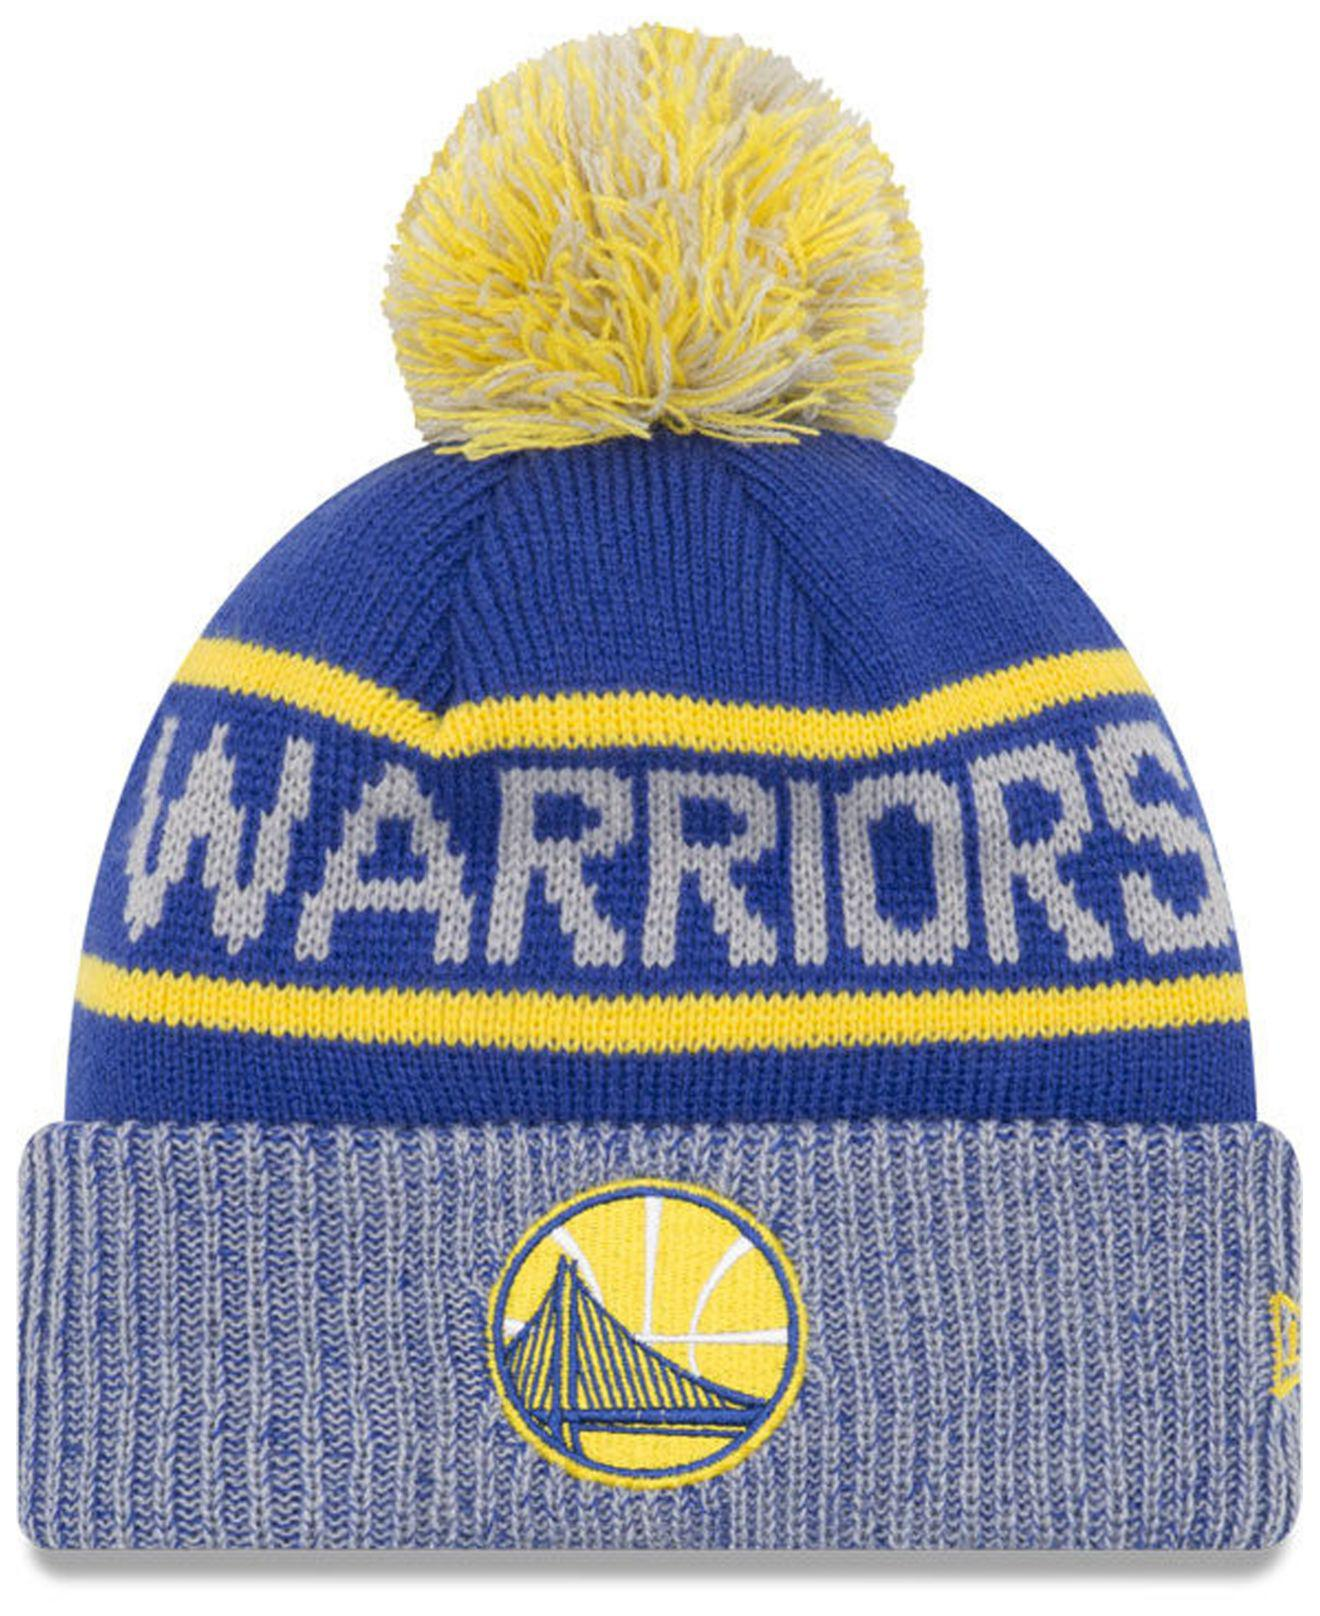 best loved 0b07f 2d05a KTZ Golden State Warriors Court Force Pom Knit Hat in Blue for Men ...